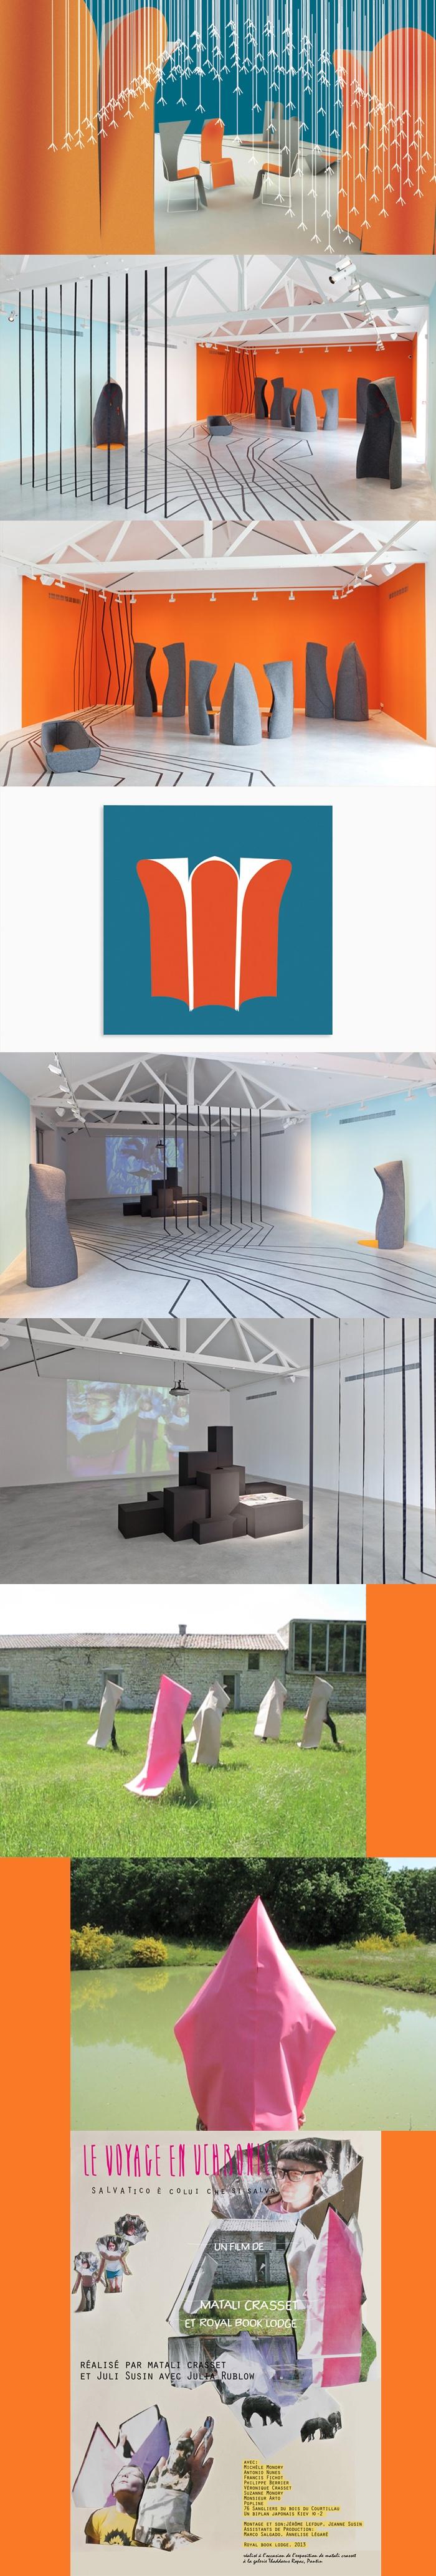 Galerie Thaddaeus Ropac – Pantin : Matali Crasset – le voyage en Uchronie